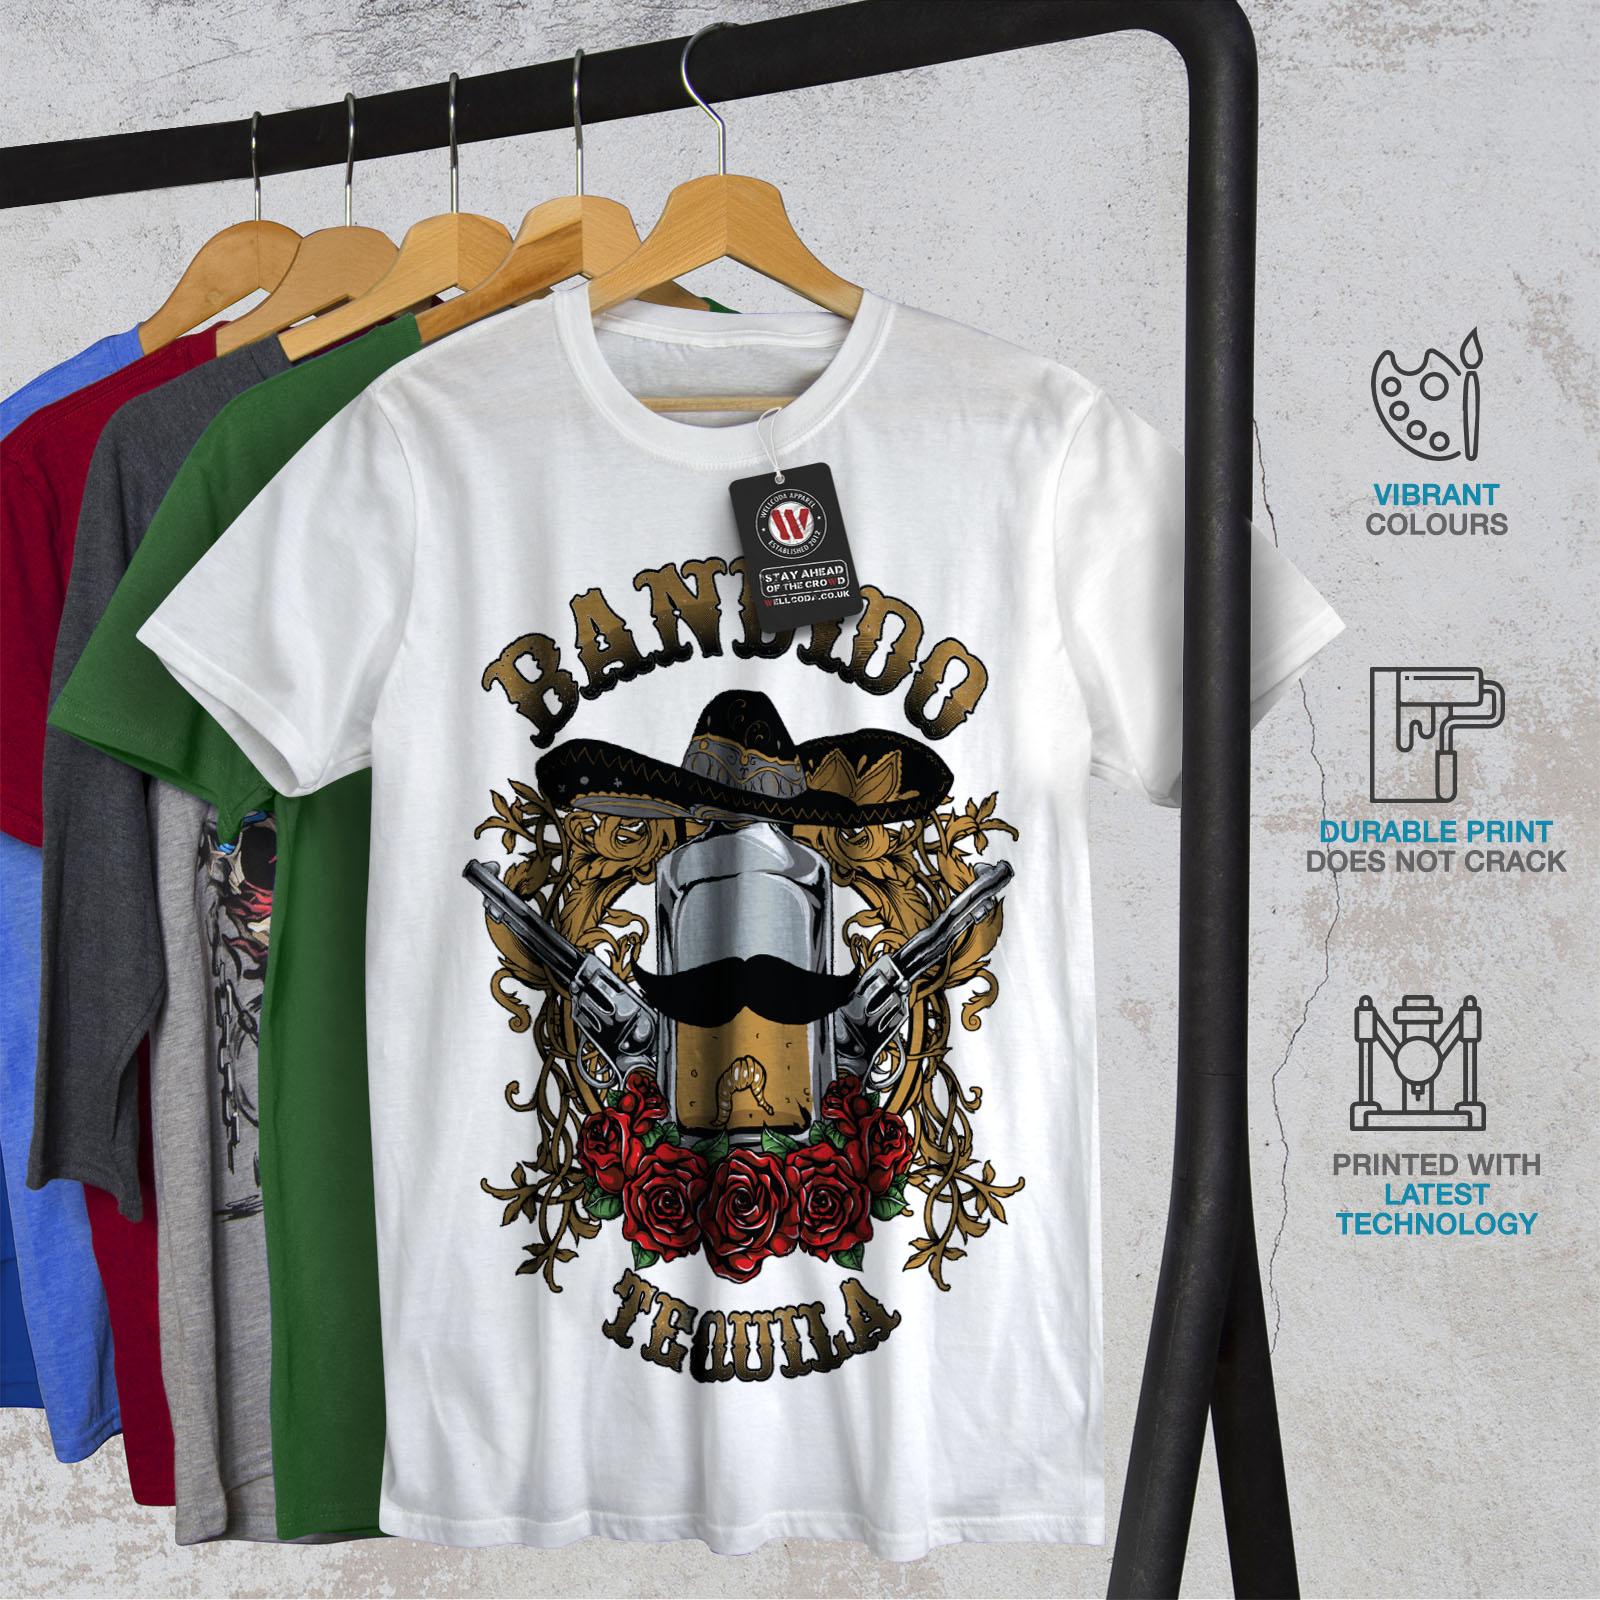 Wellcoda Bandido Tequila Rose Mens T-shirt Mexico Graphic Design Printed Tee